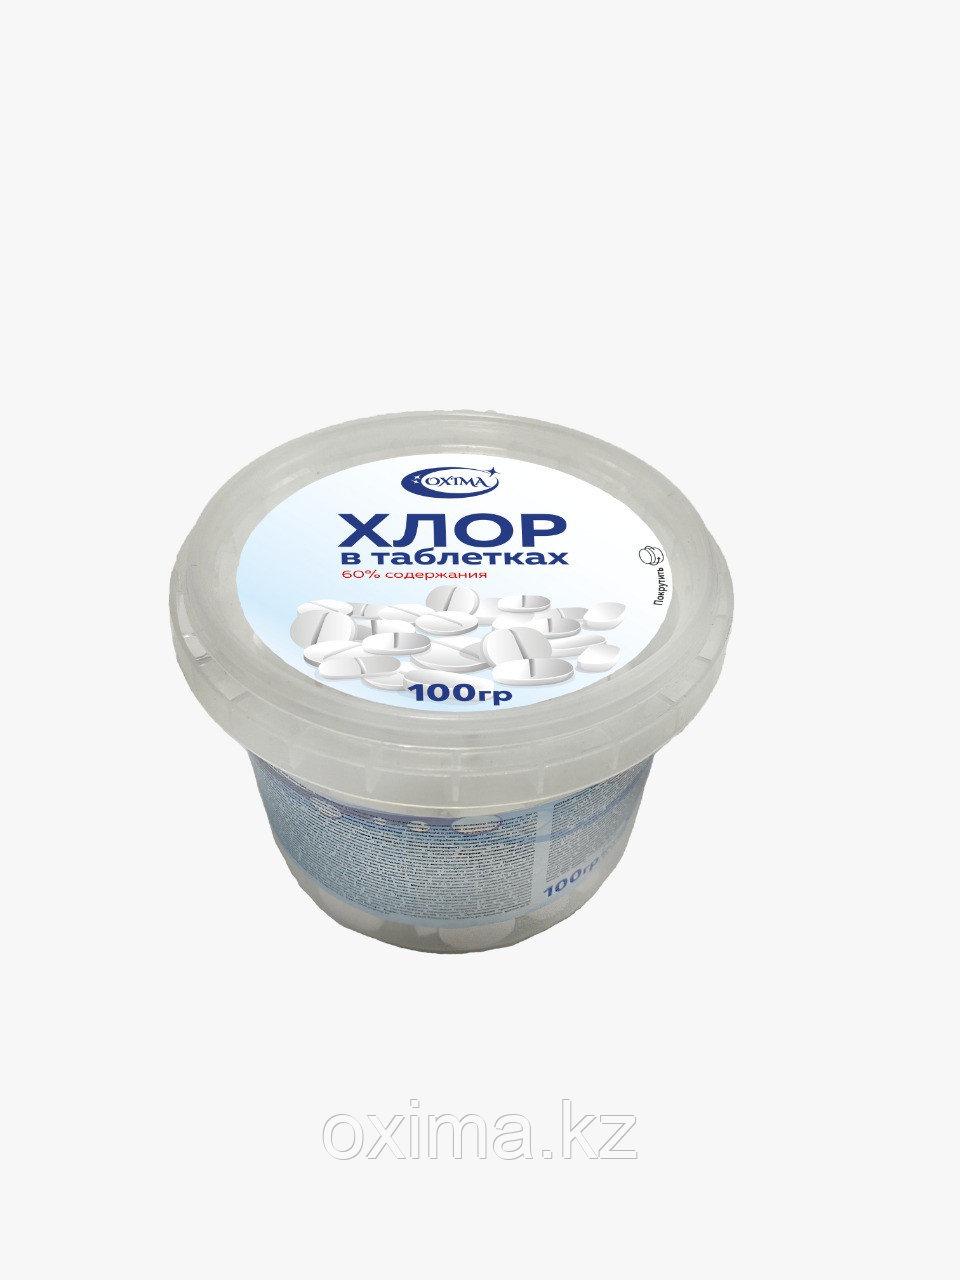 Хлор в таблетках 100 гр Oxima 100 шт